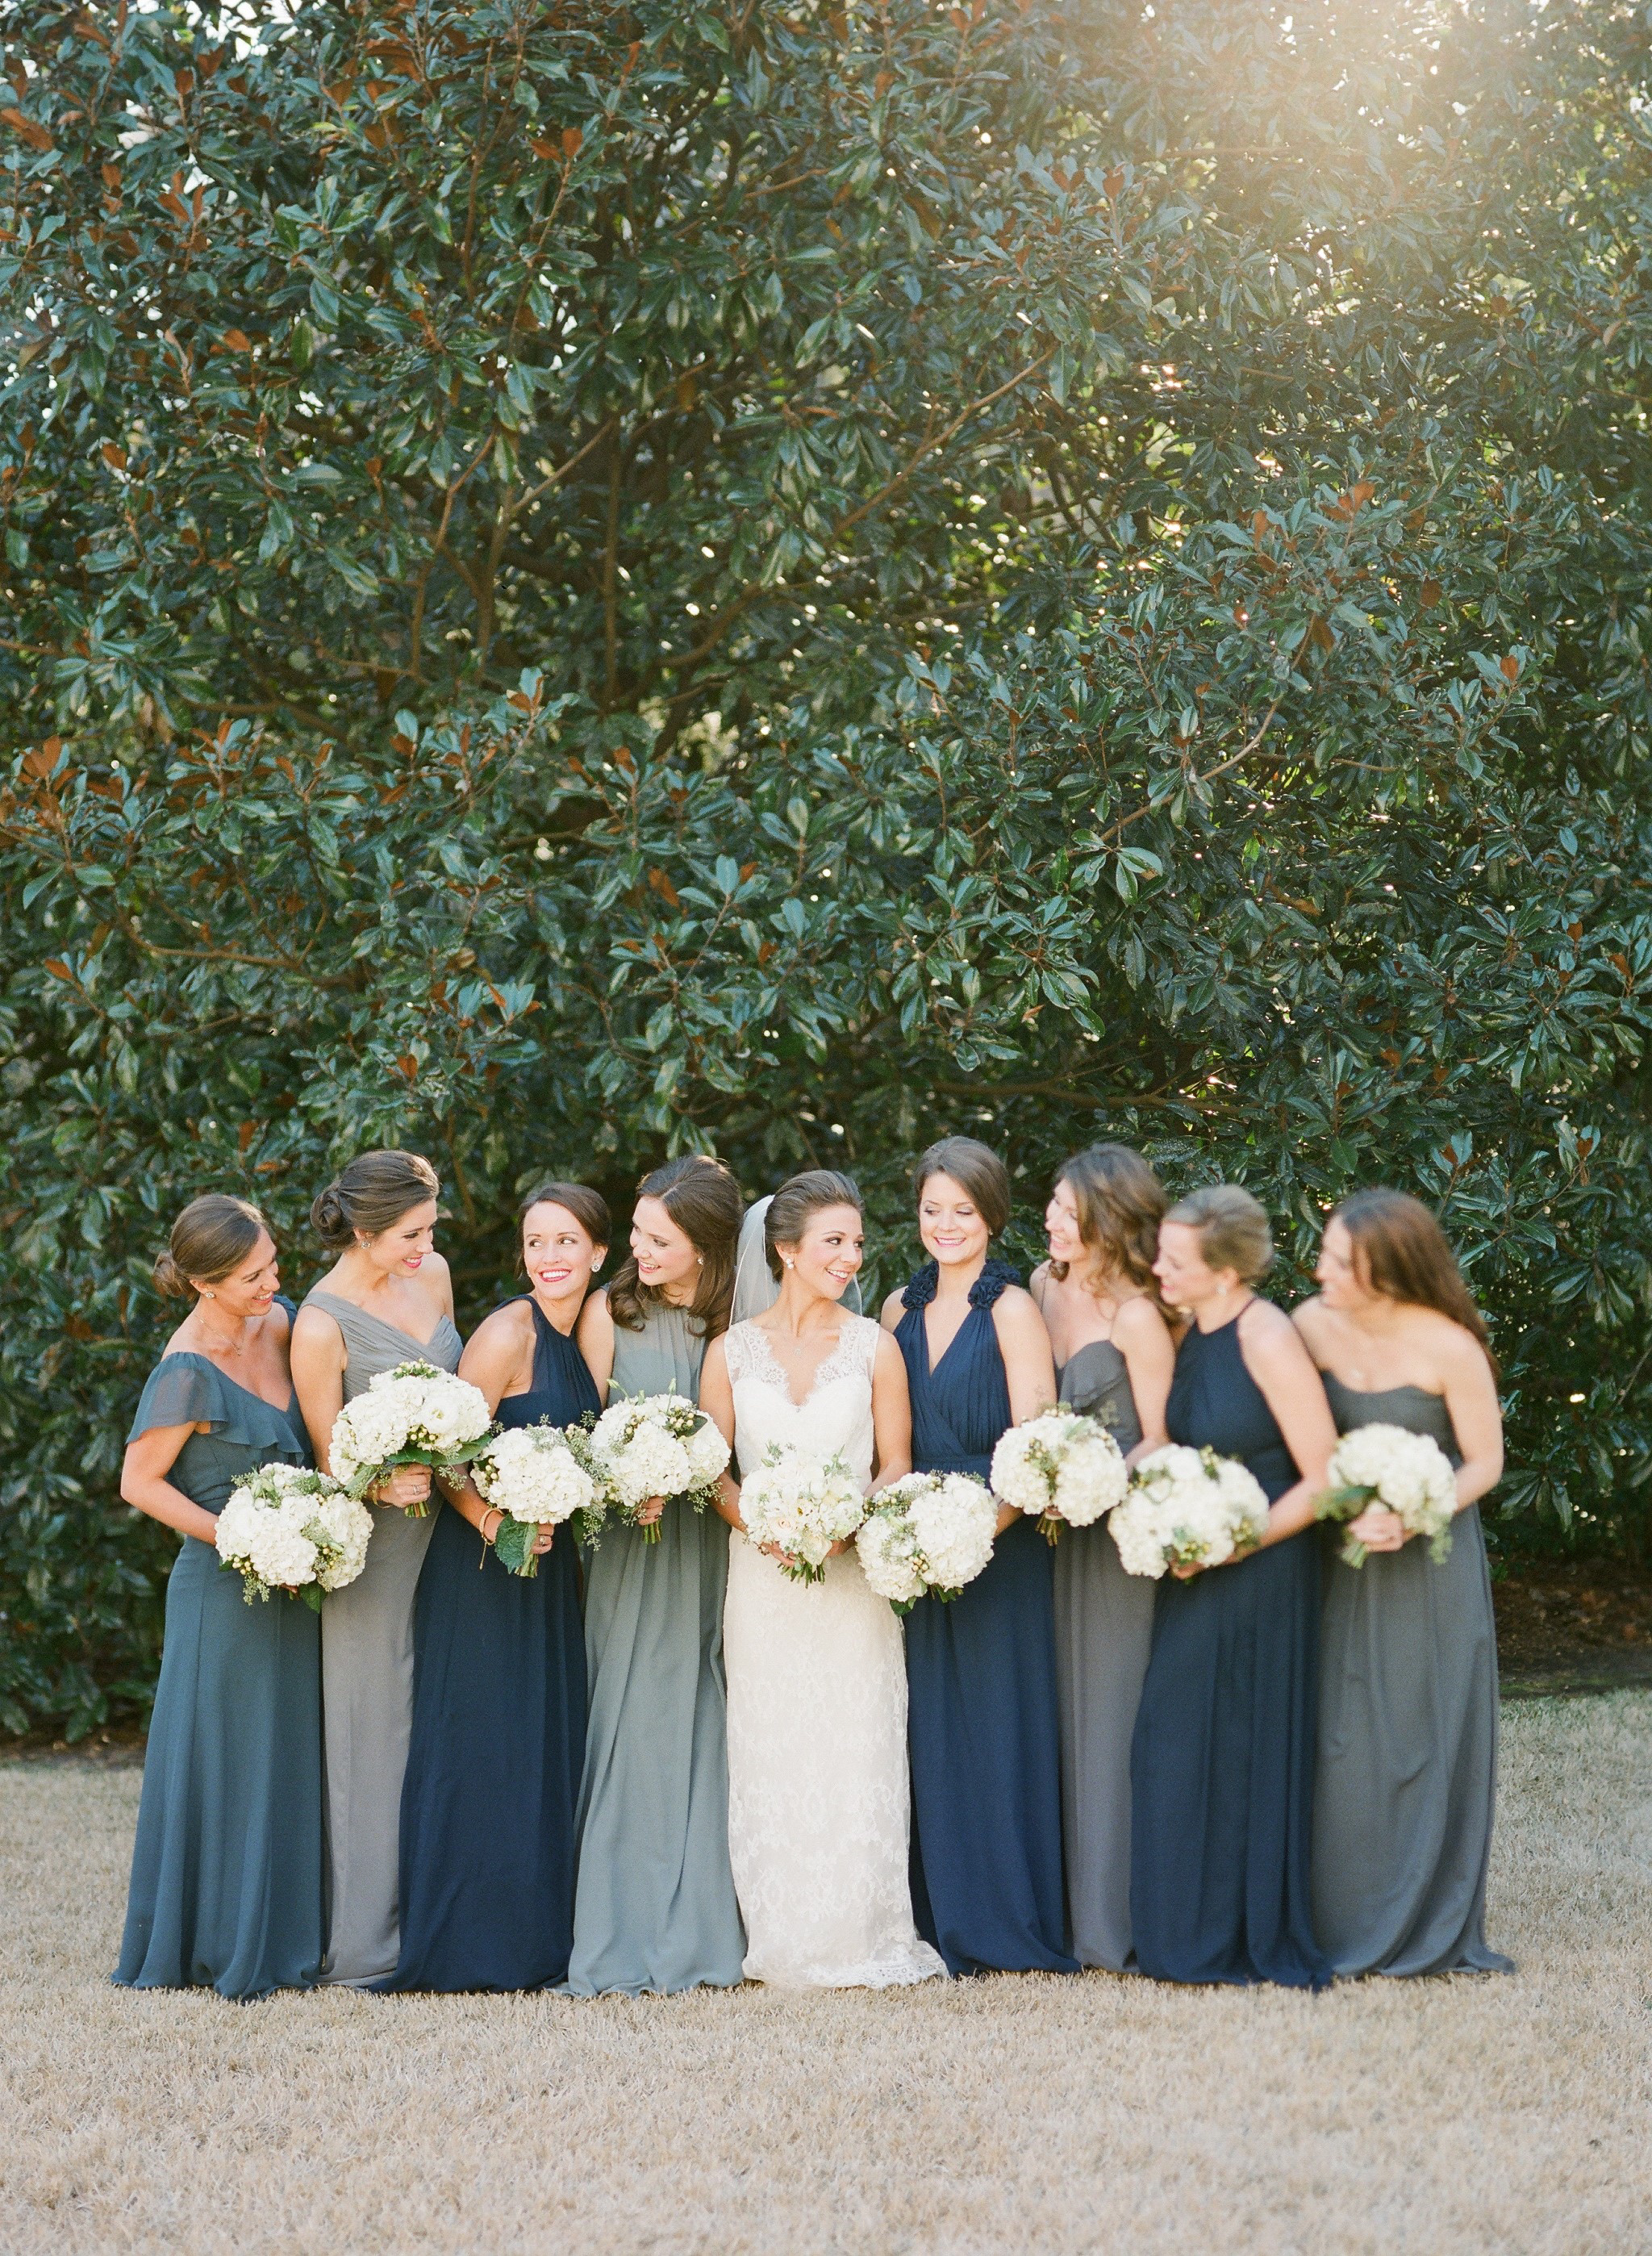 Shades Of Blue Bridesmaids Dresses Elizabeth Anne